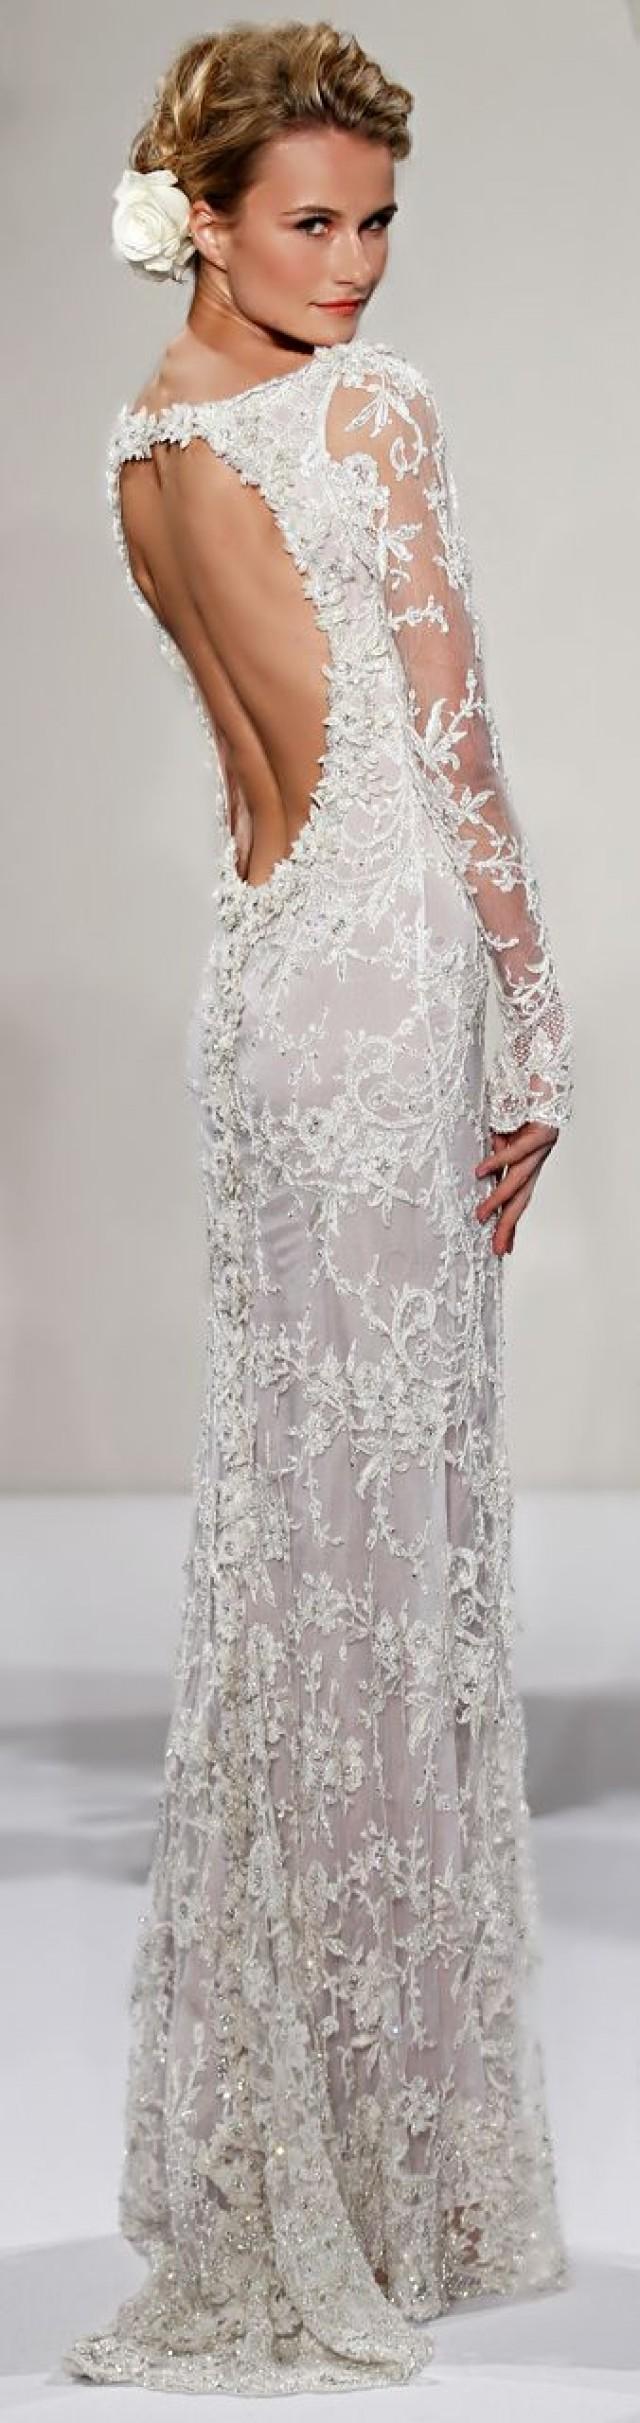 Wedding Dresses - Wedding Dress ○ Pnina Tornai #2061776 - Weddbook